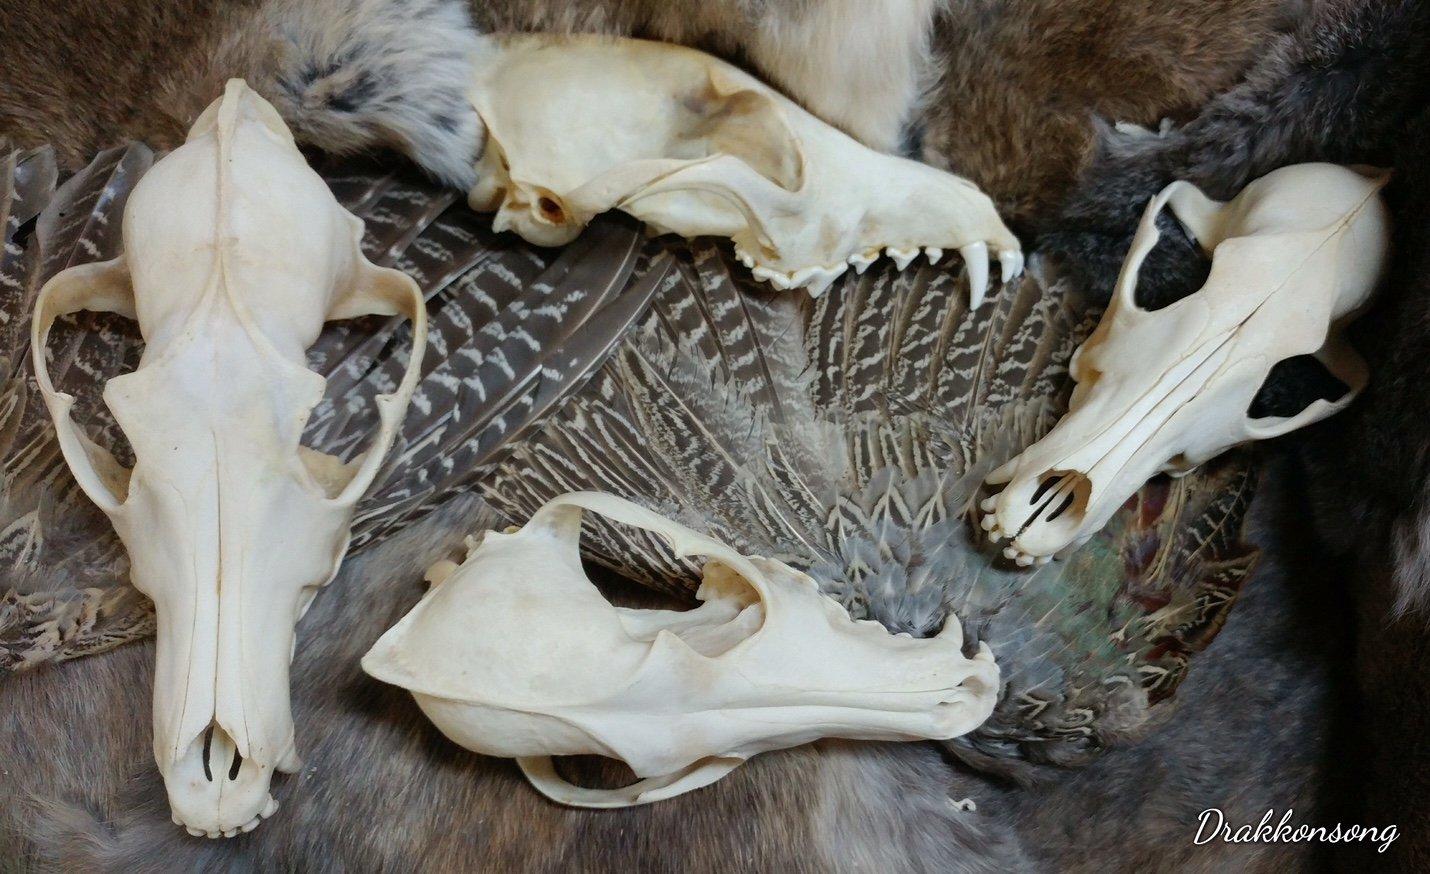 Real Bone Coyote Skull Taxidermy - Top Half Only + Rabbit Pelt